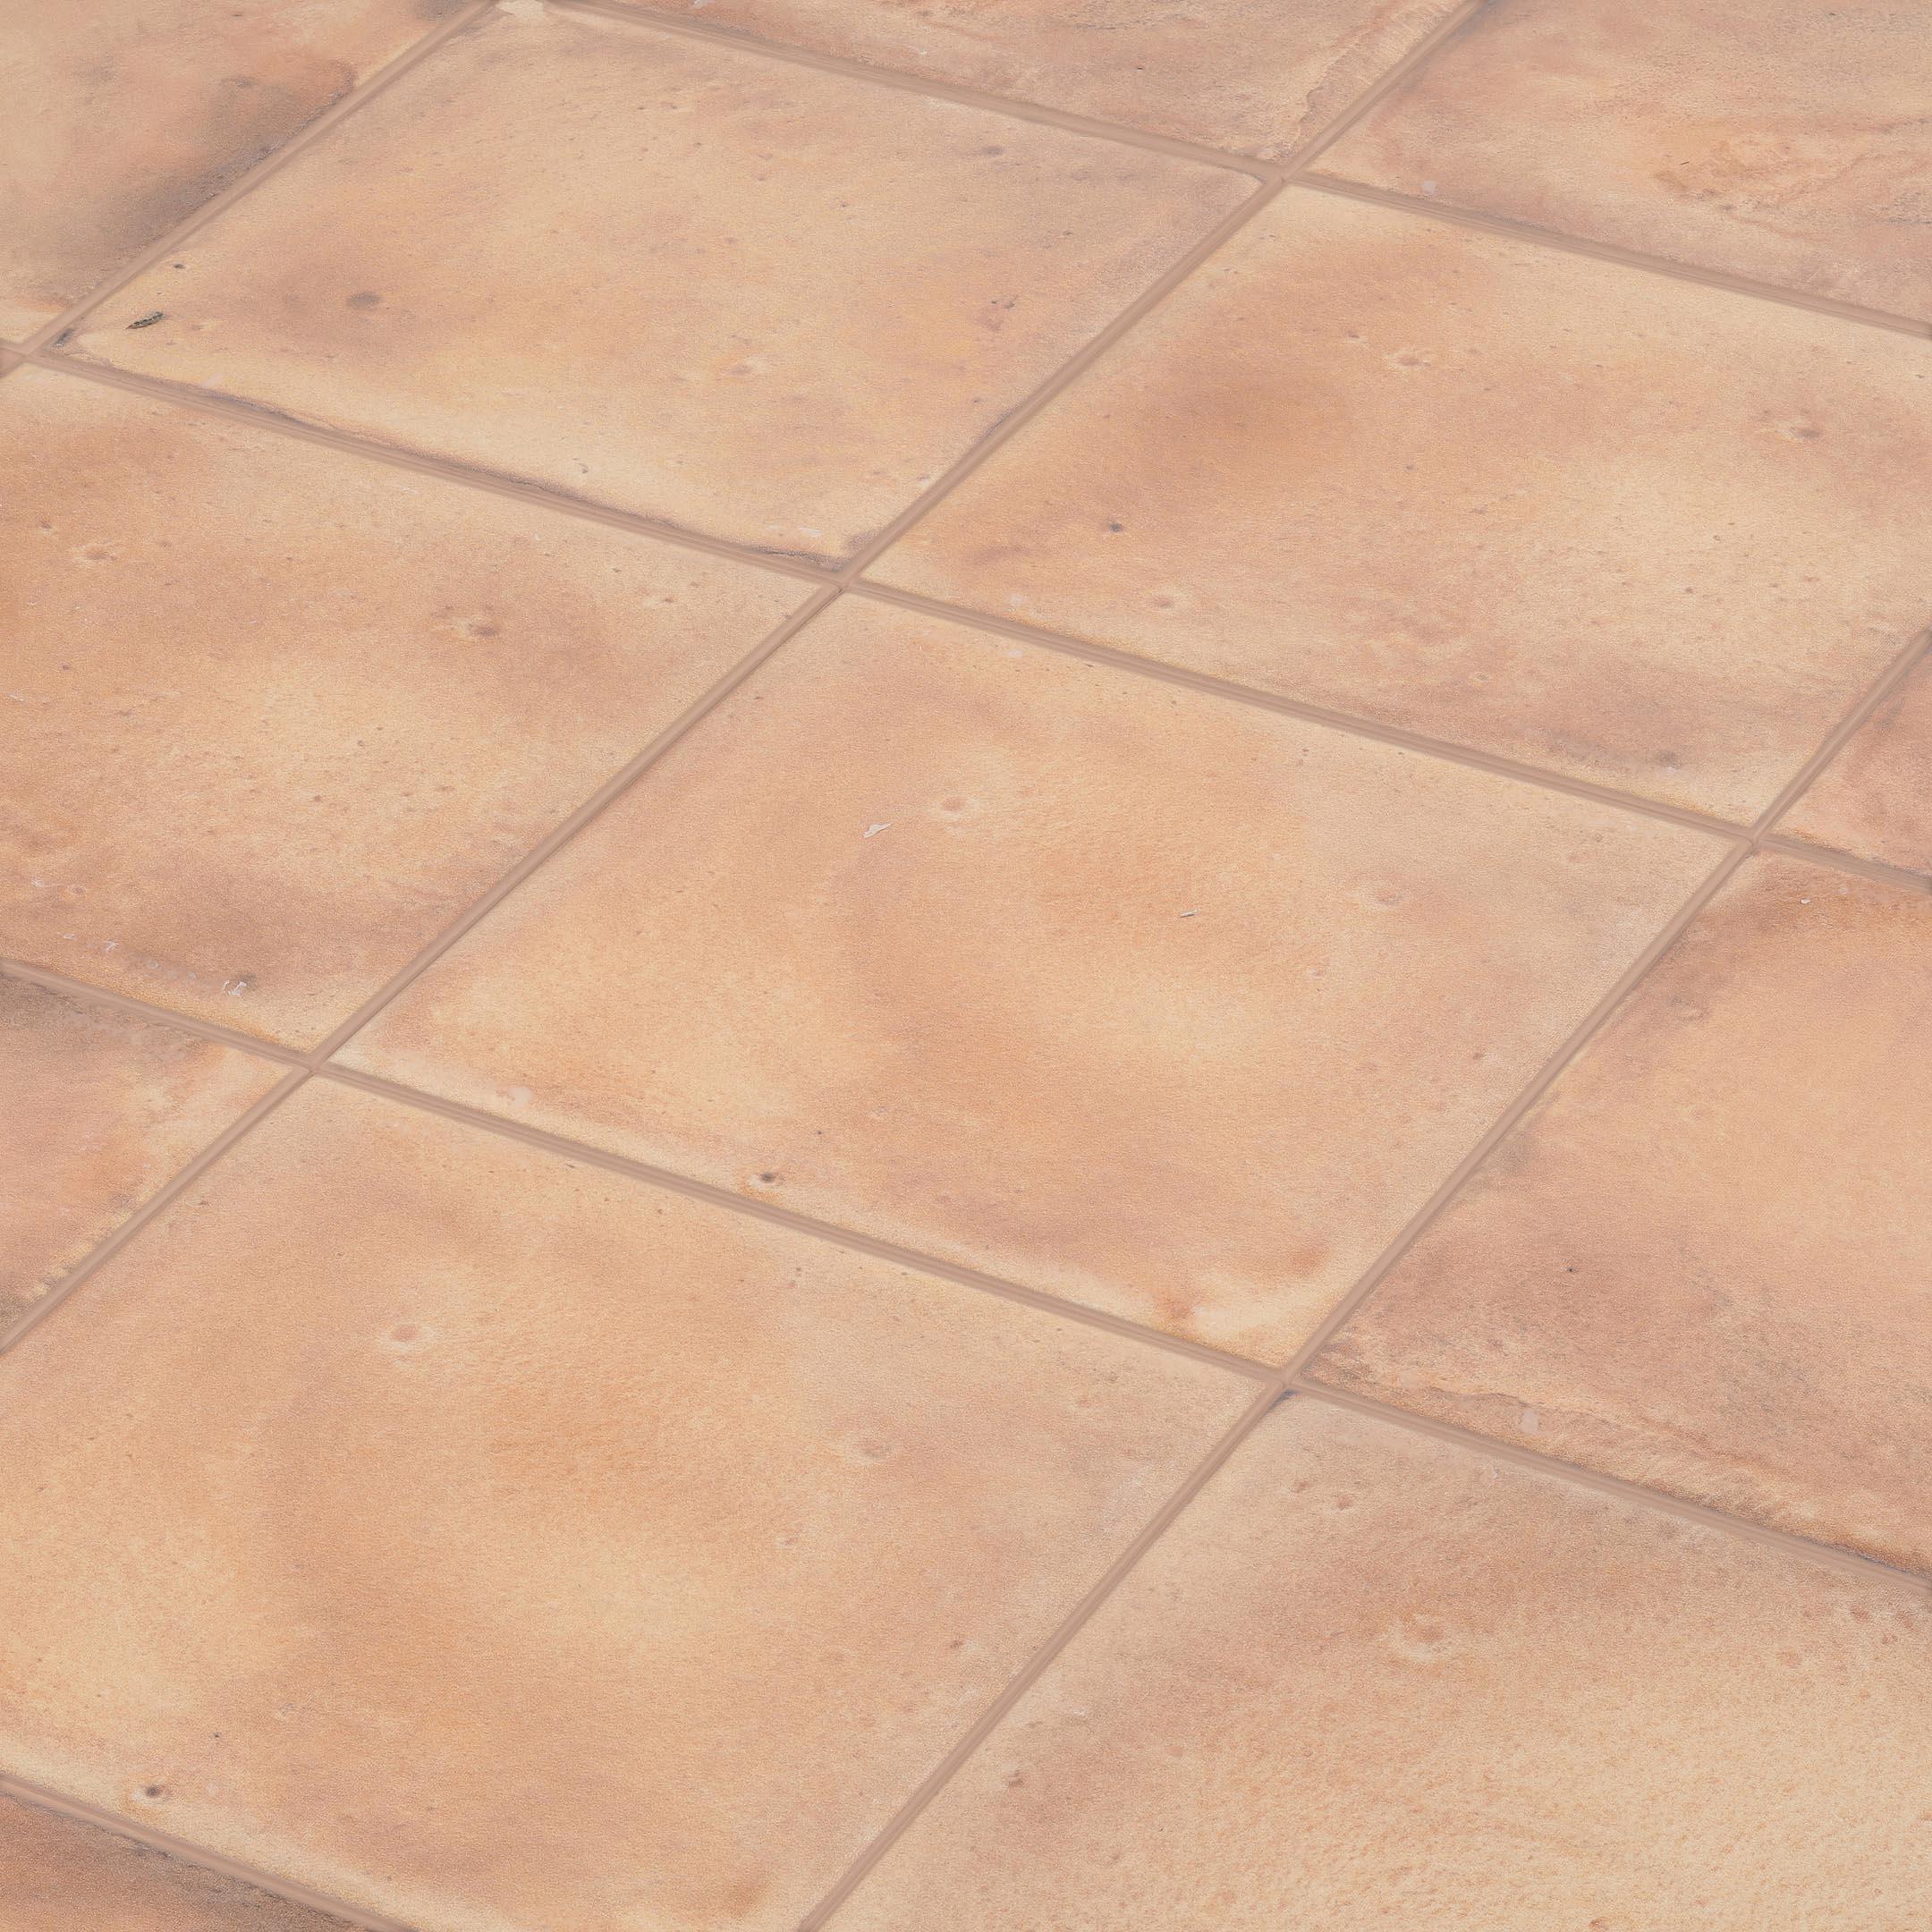 Плитка облицовочная Керамин Гранада 3С бежевый 200x200x7 мм (26 шт.=1,04 кв.м) плитка облицовочная керамин гранада 1с серый 200x200x7 мм 26 шт 1 04 кв м